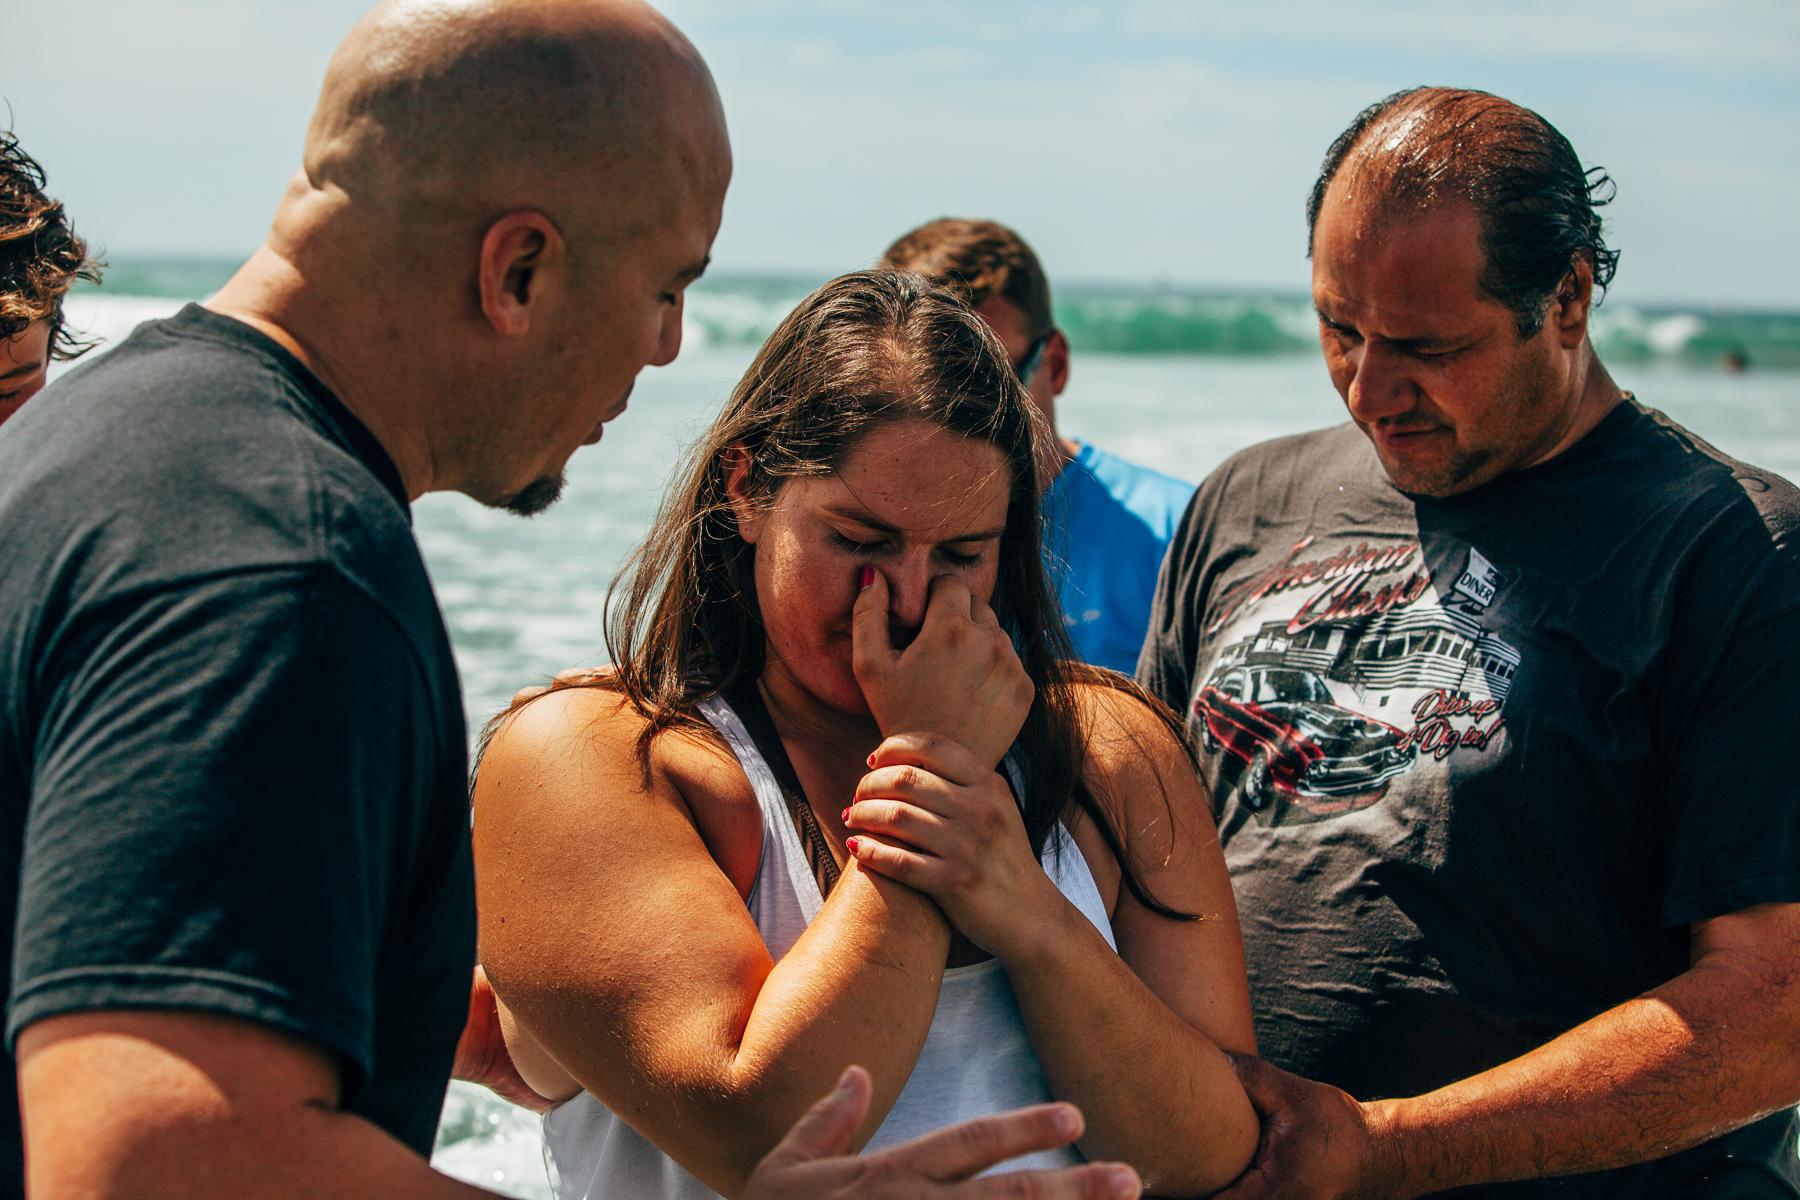 Beach_Baptism_2015_55.jpg